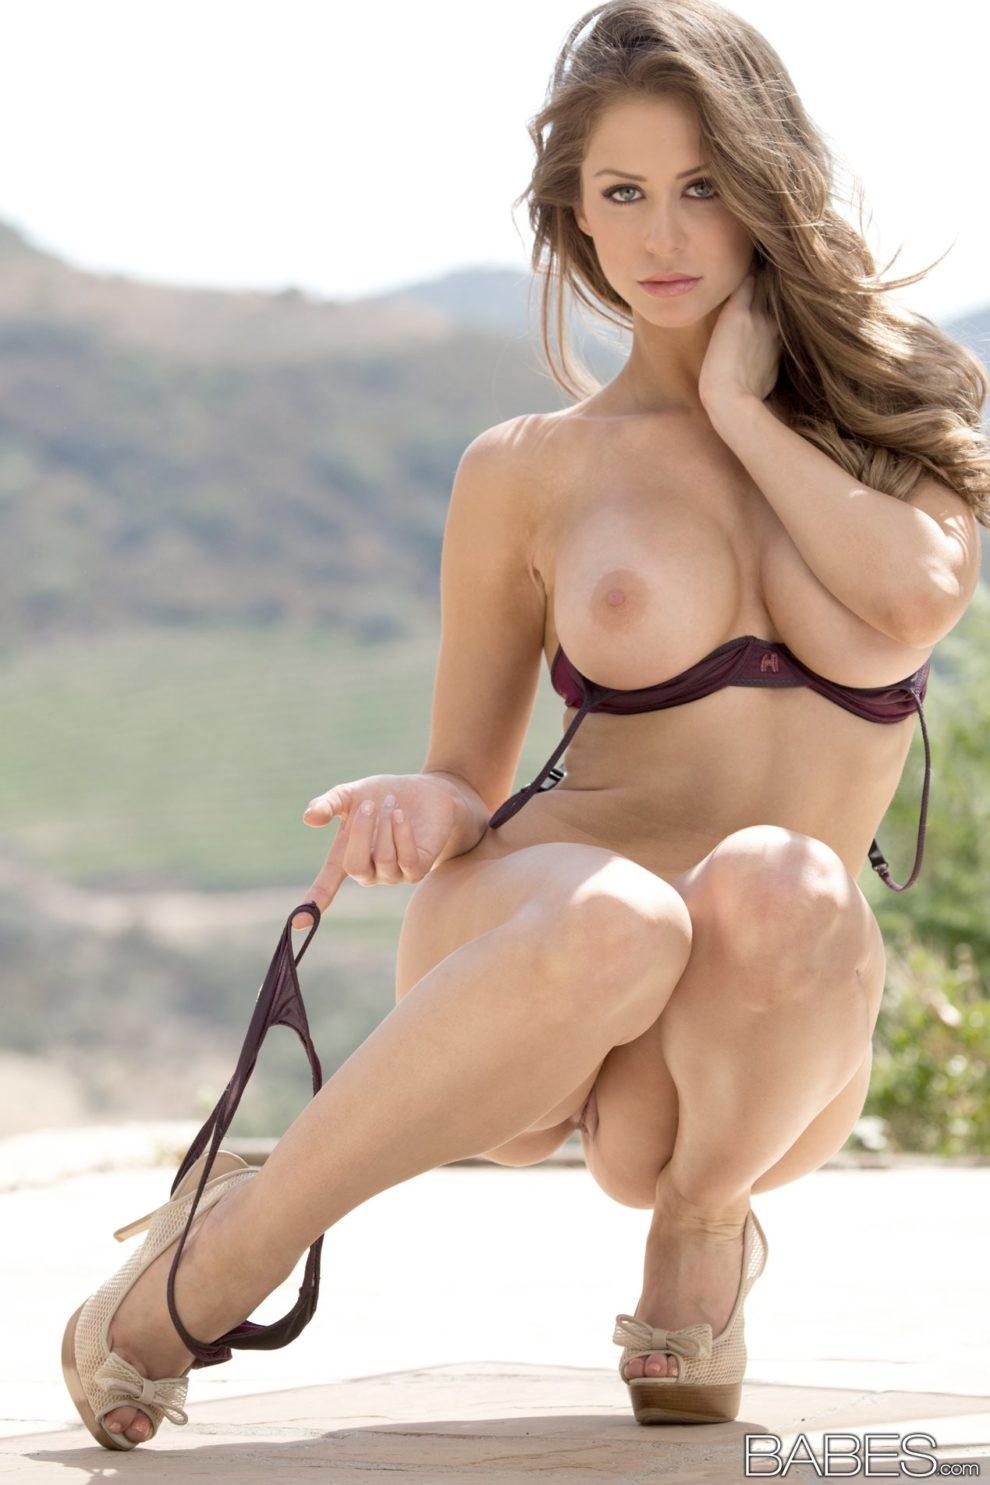 Nude babe erotic pics